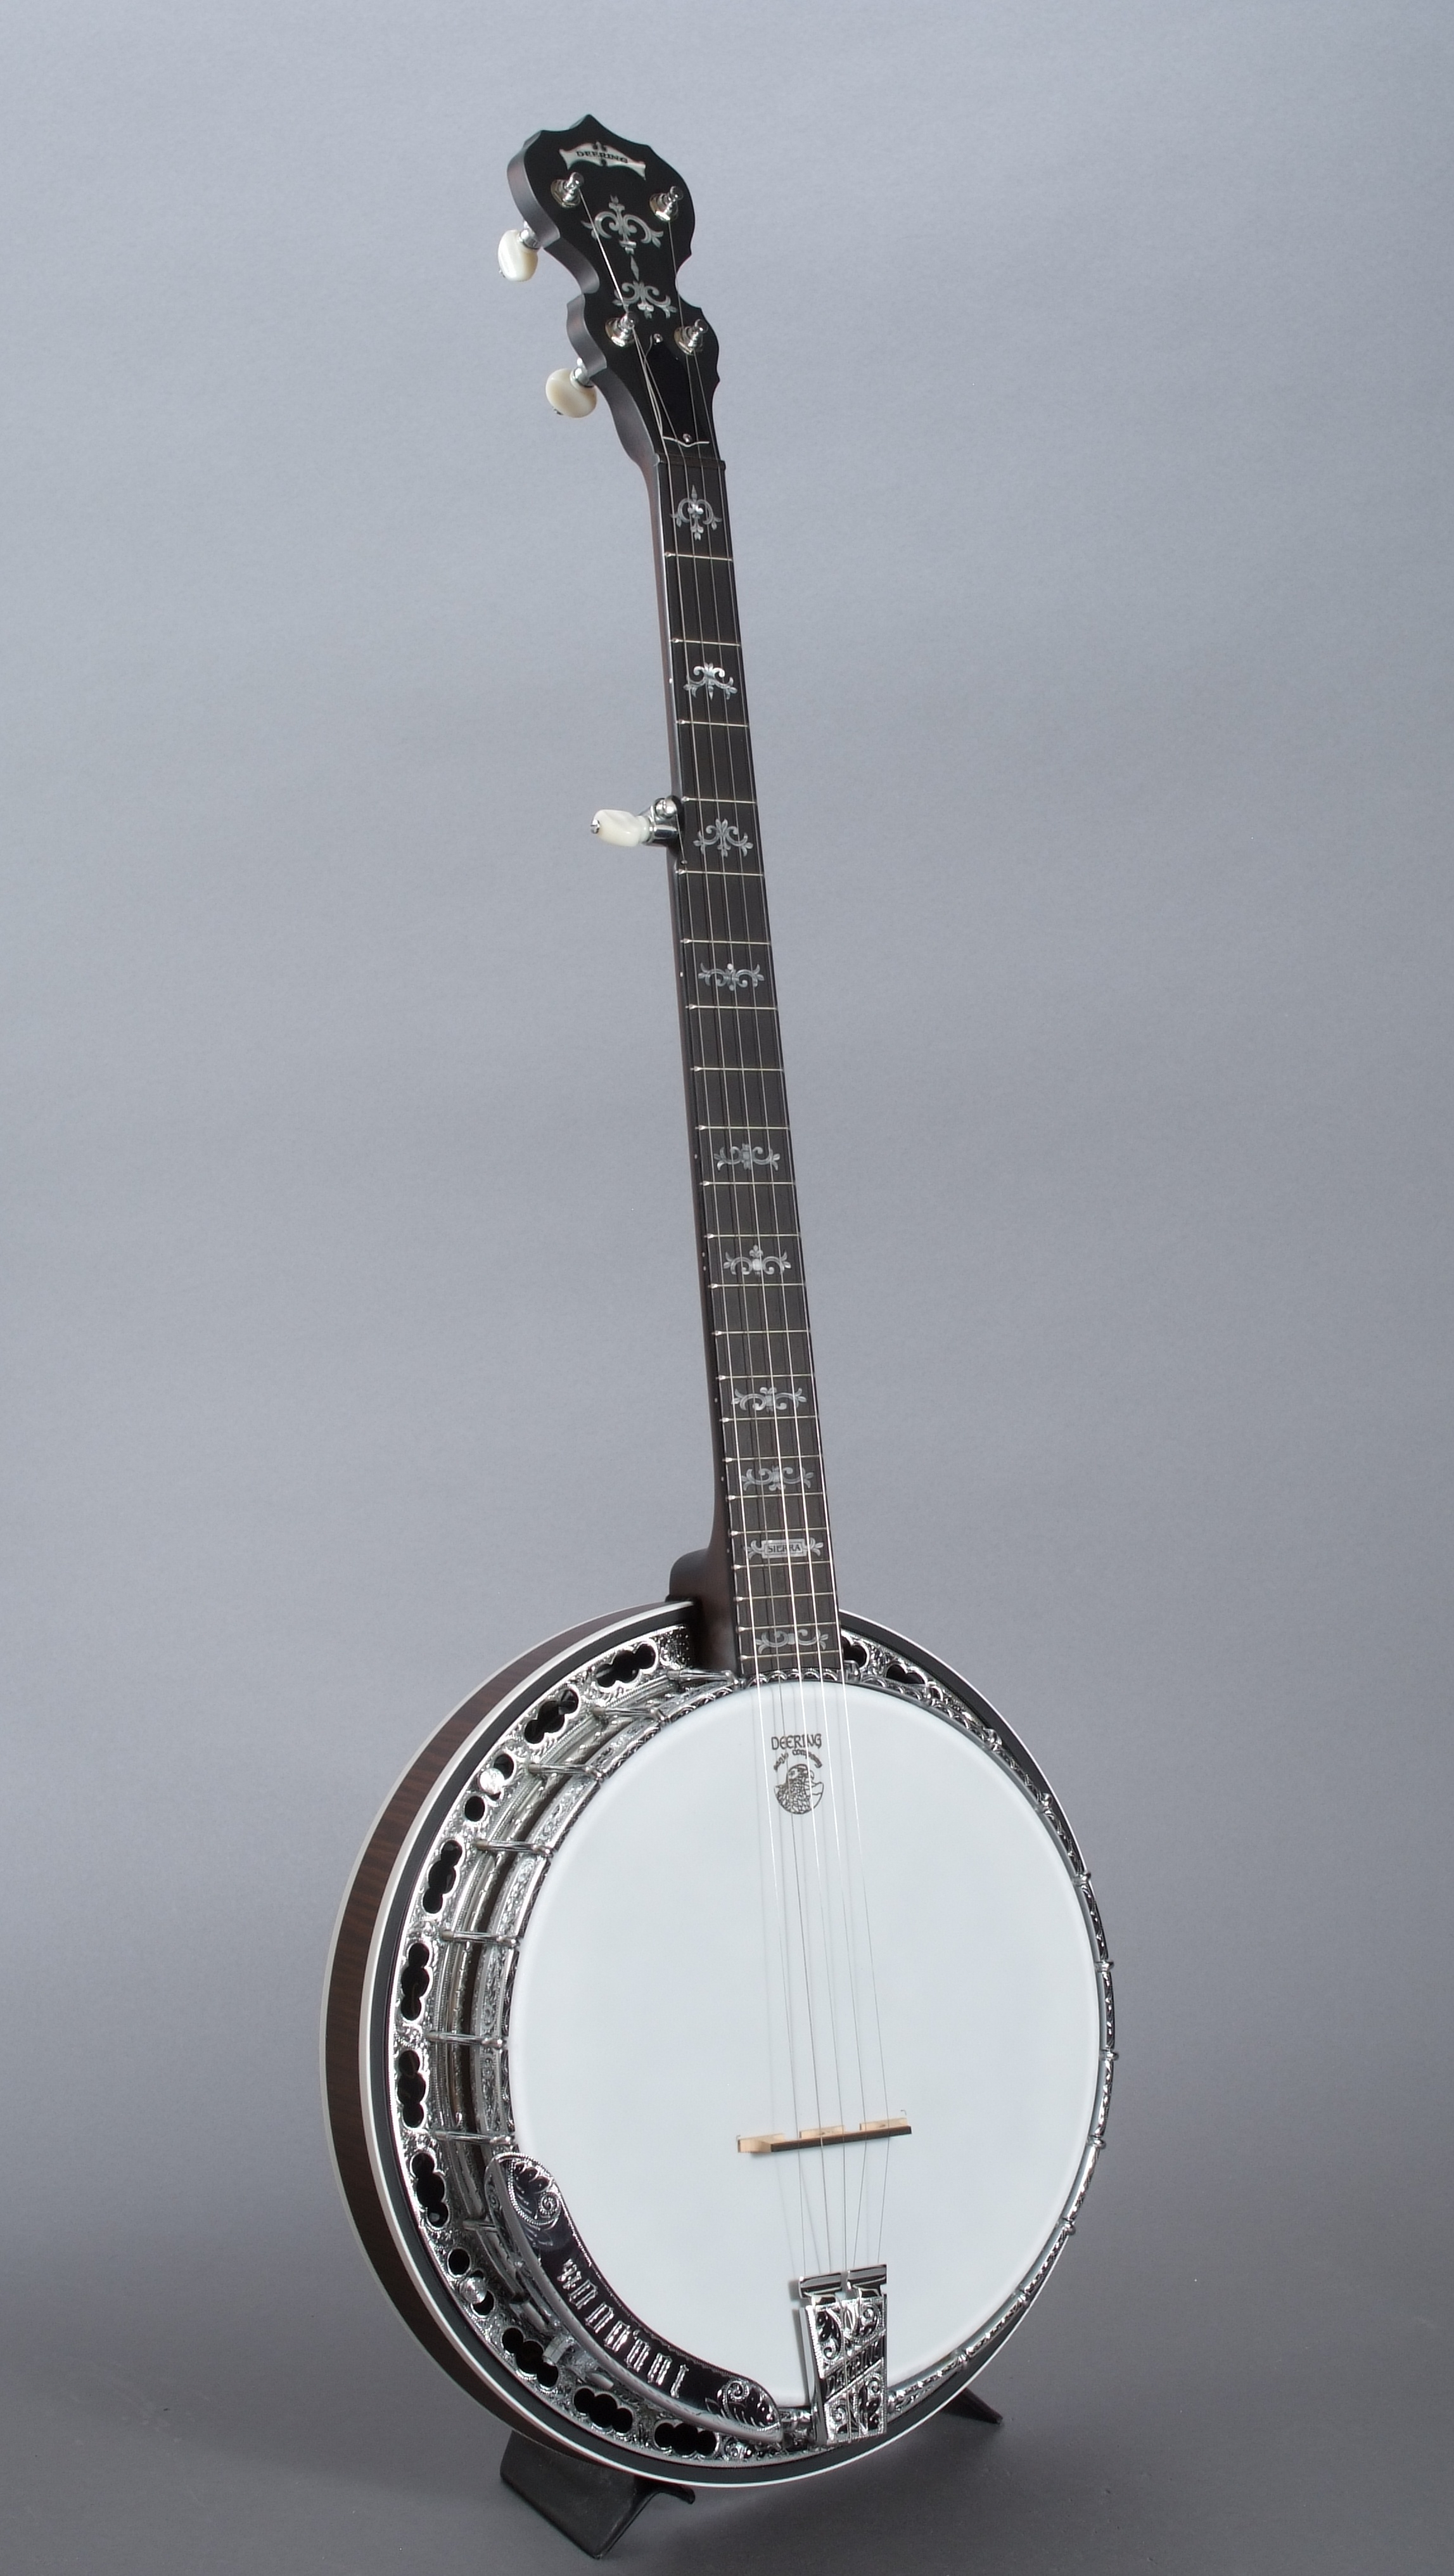 100,000th banjo full shot - crop.jpg